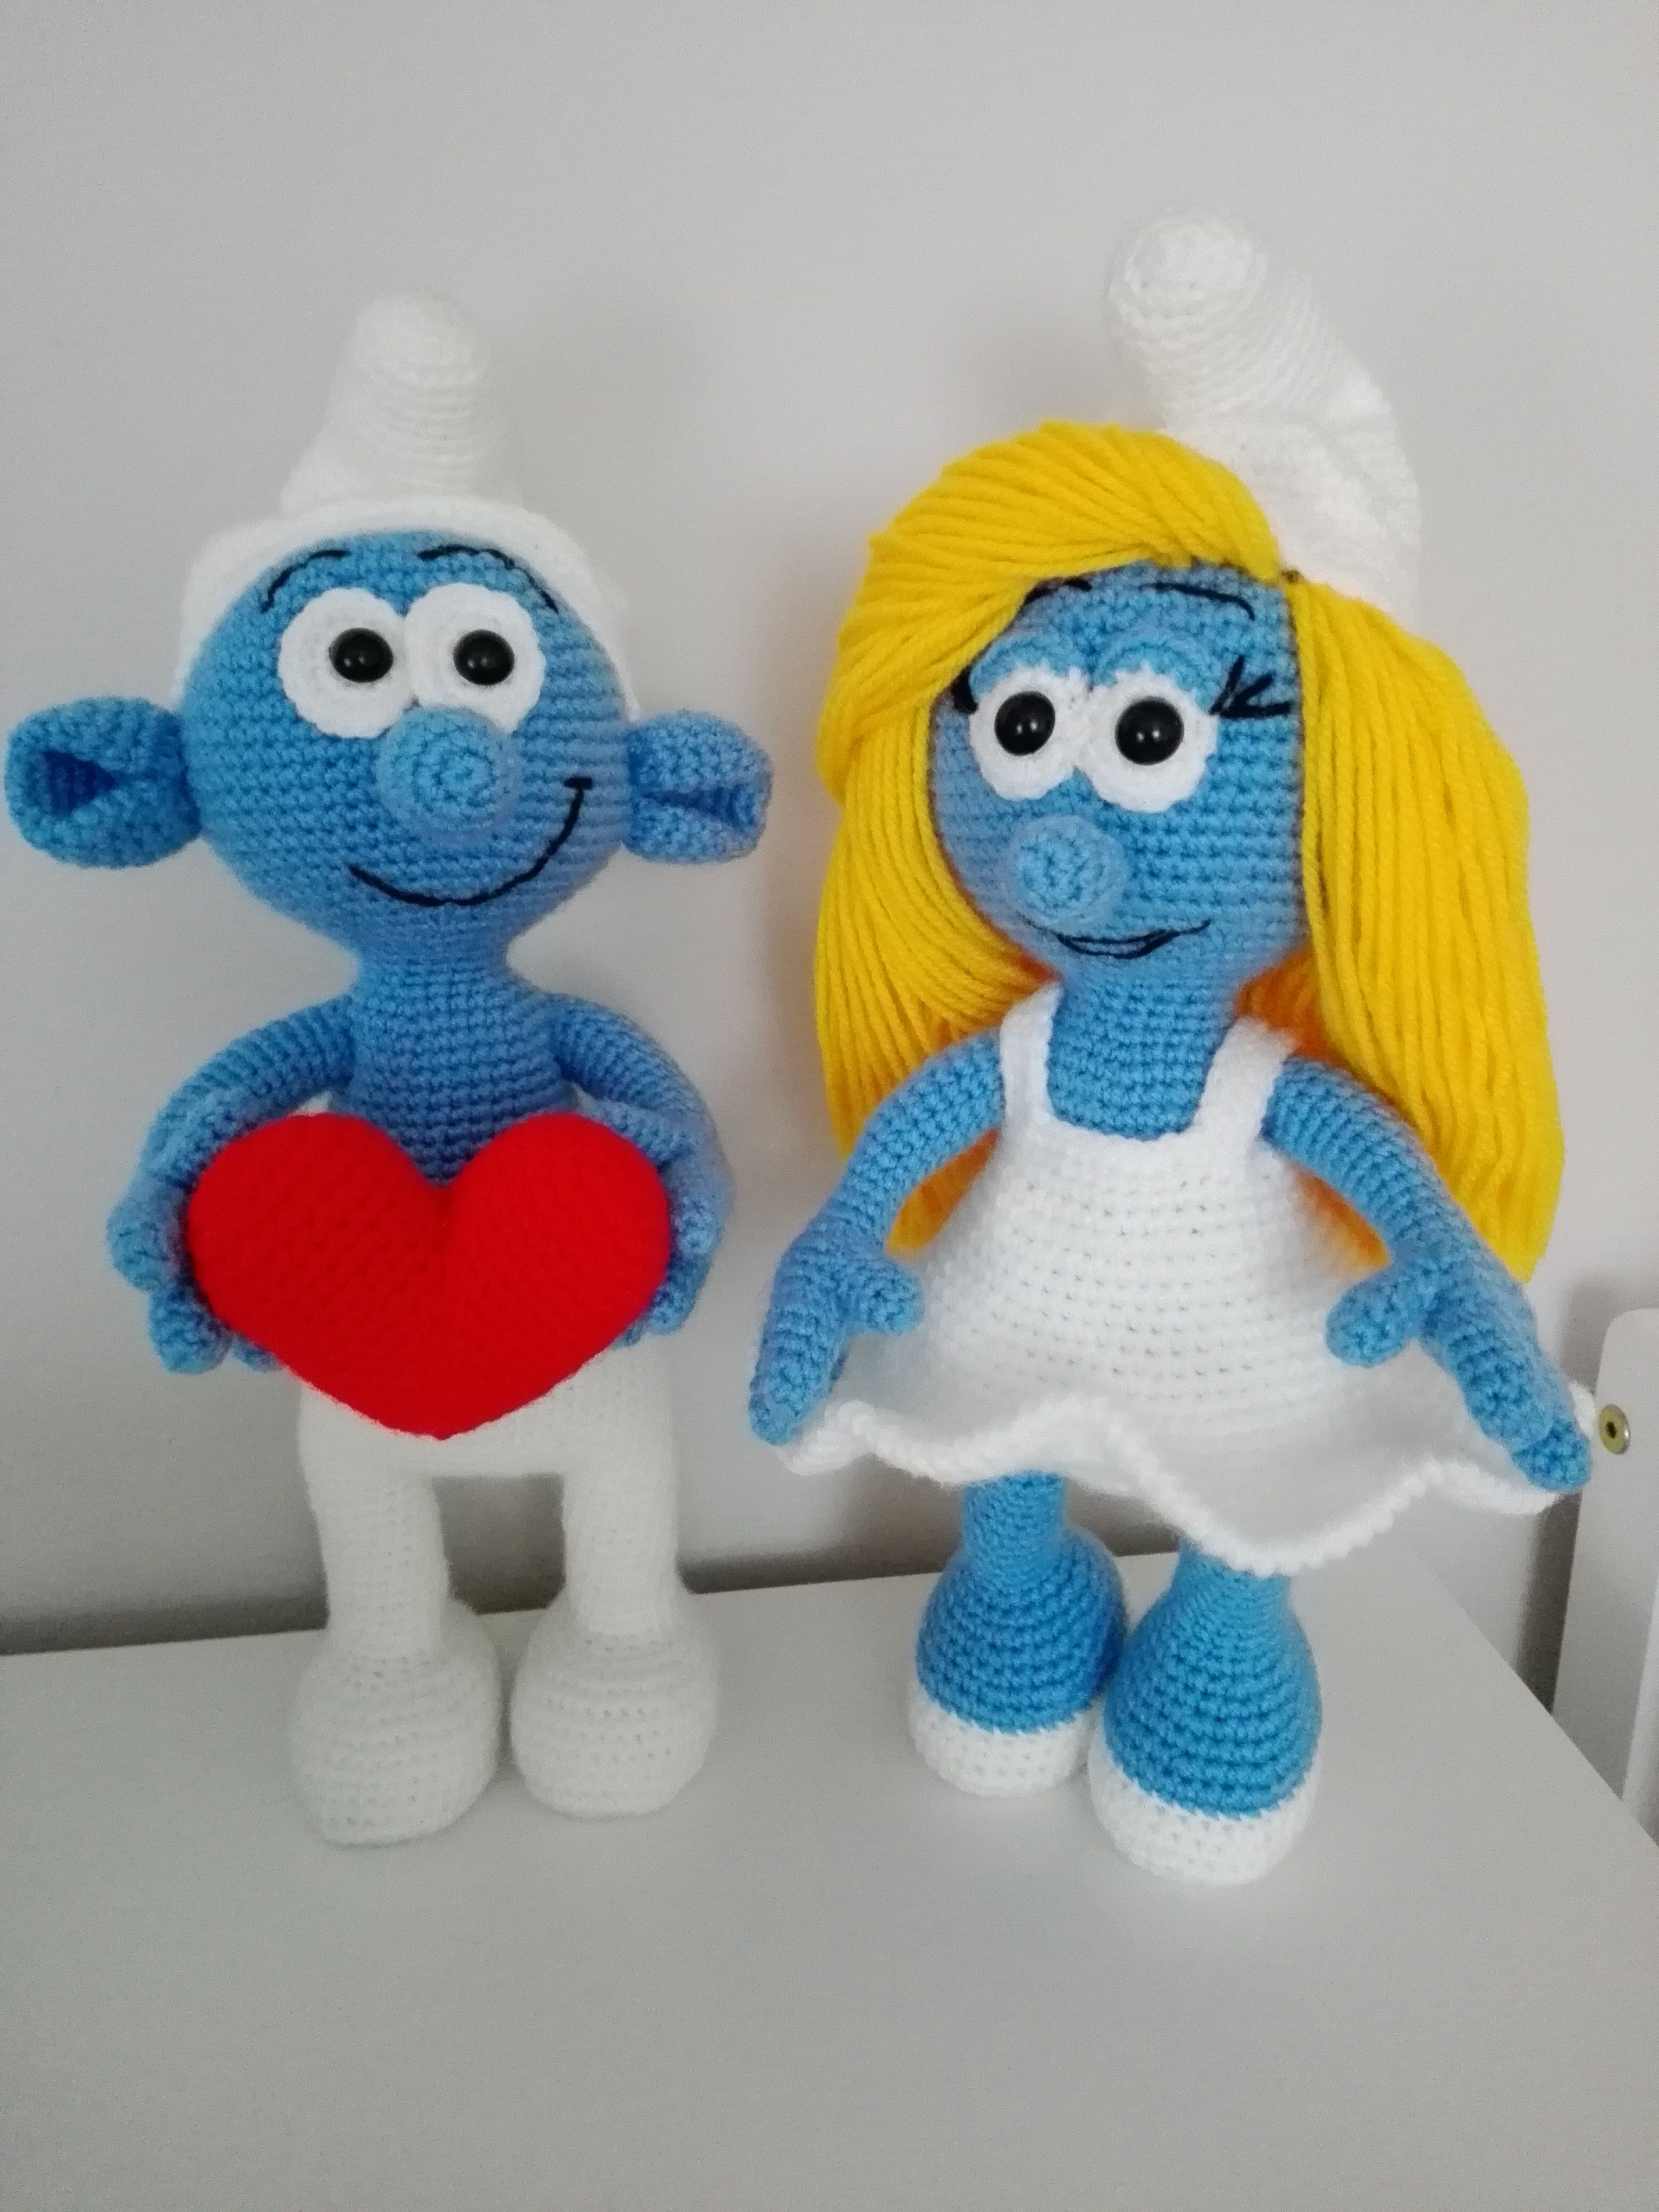 Smerfy smurfs crochet crochet tatting scrap pinterest smerfy smurfs crochet bankloansurffo Image collections